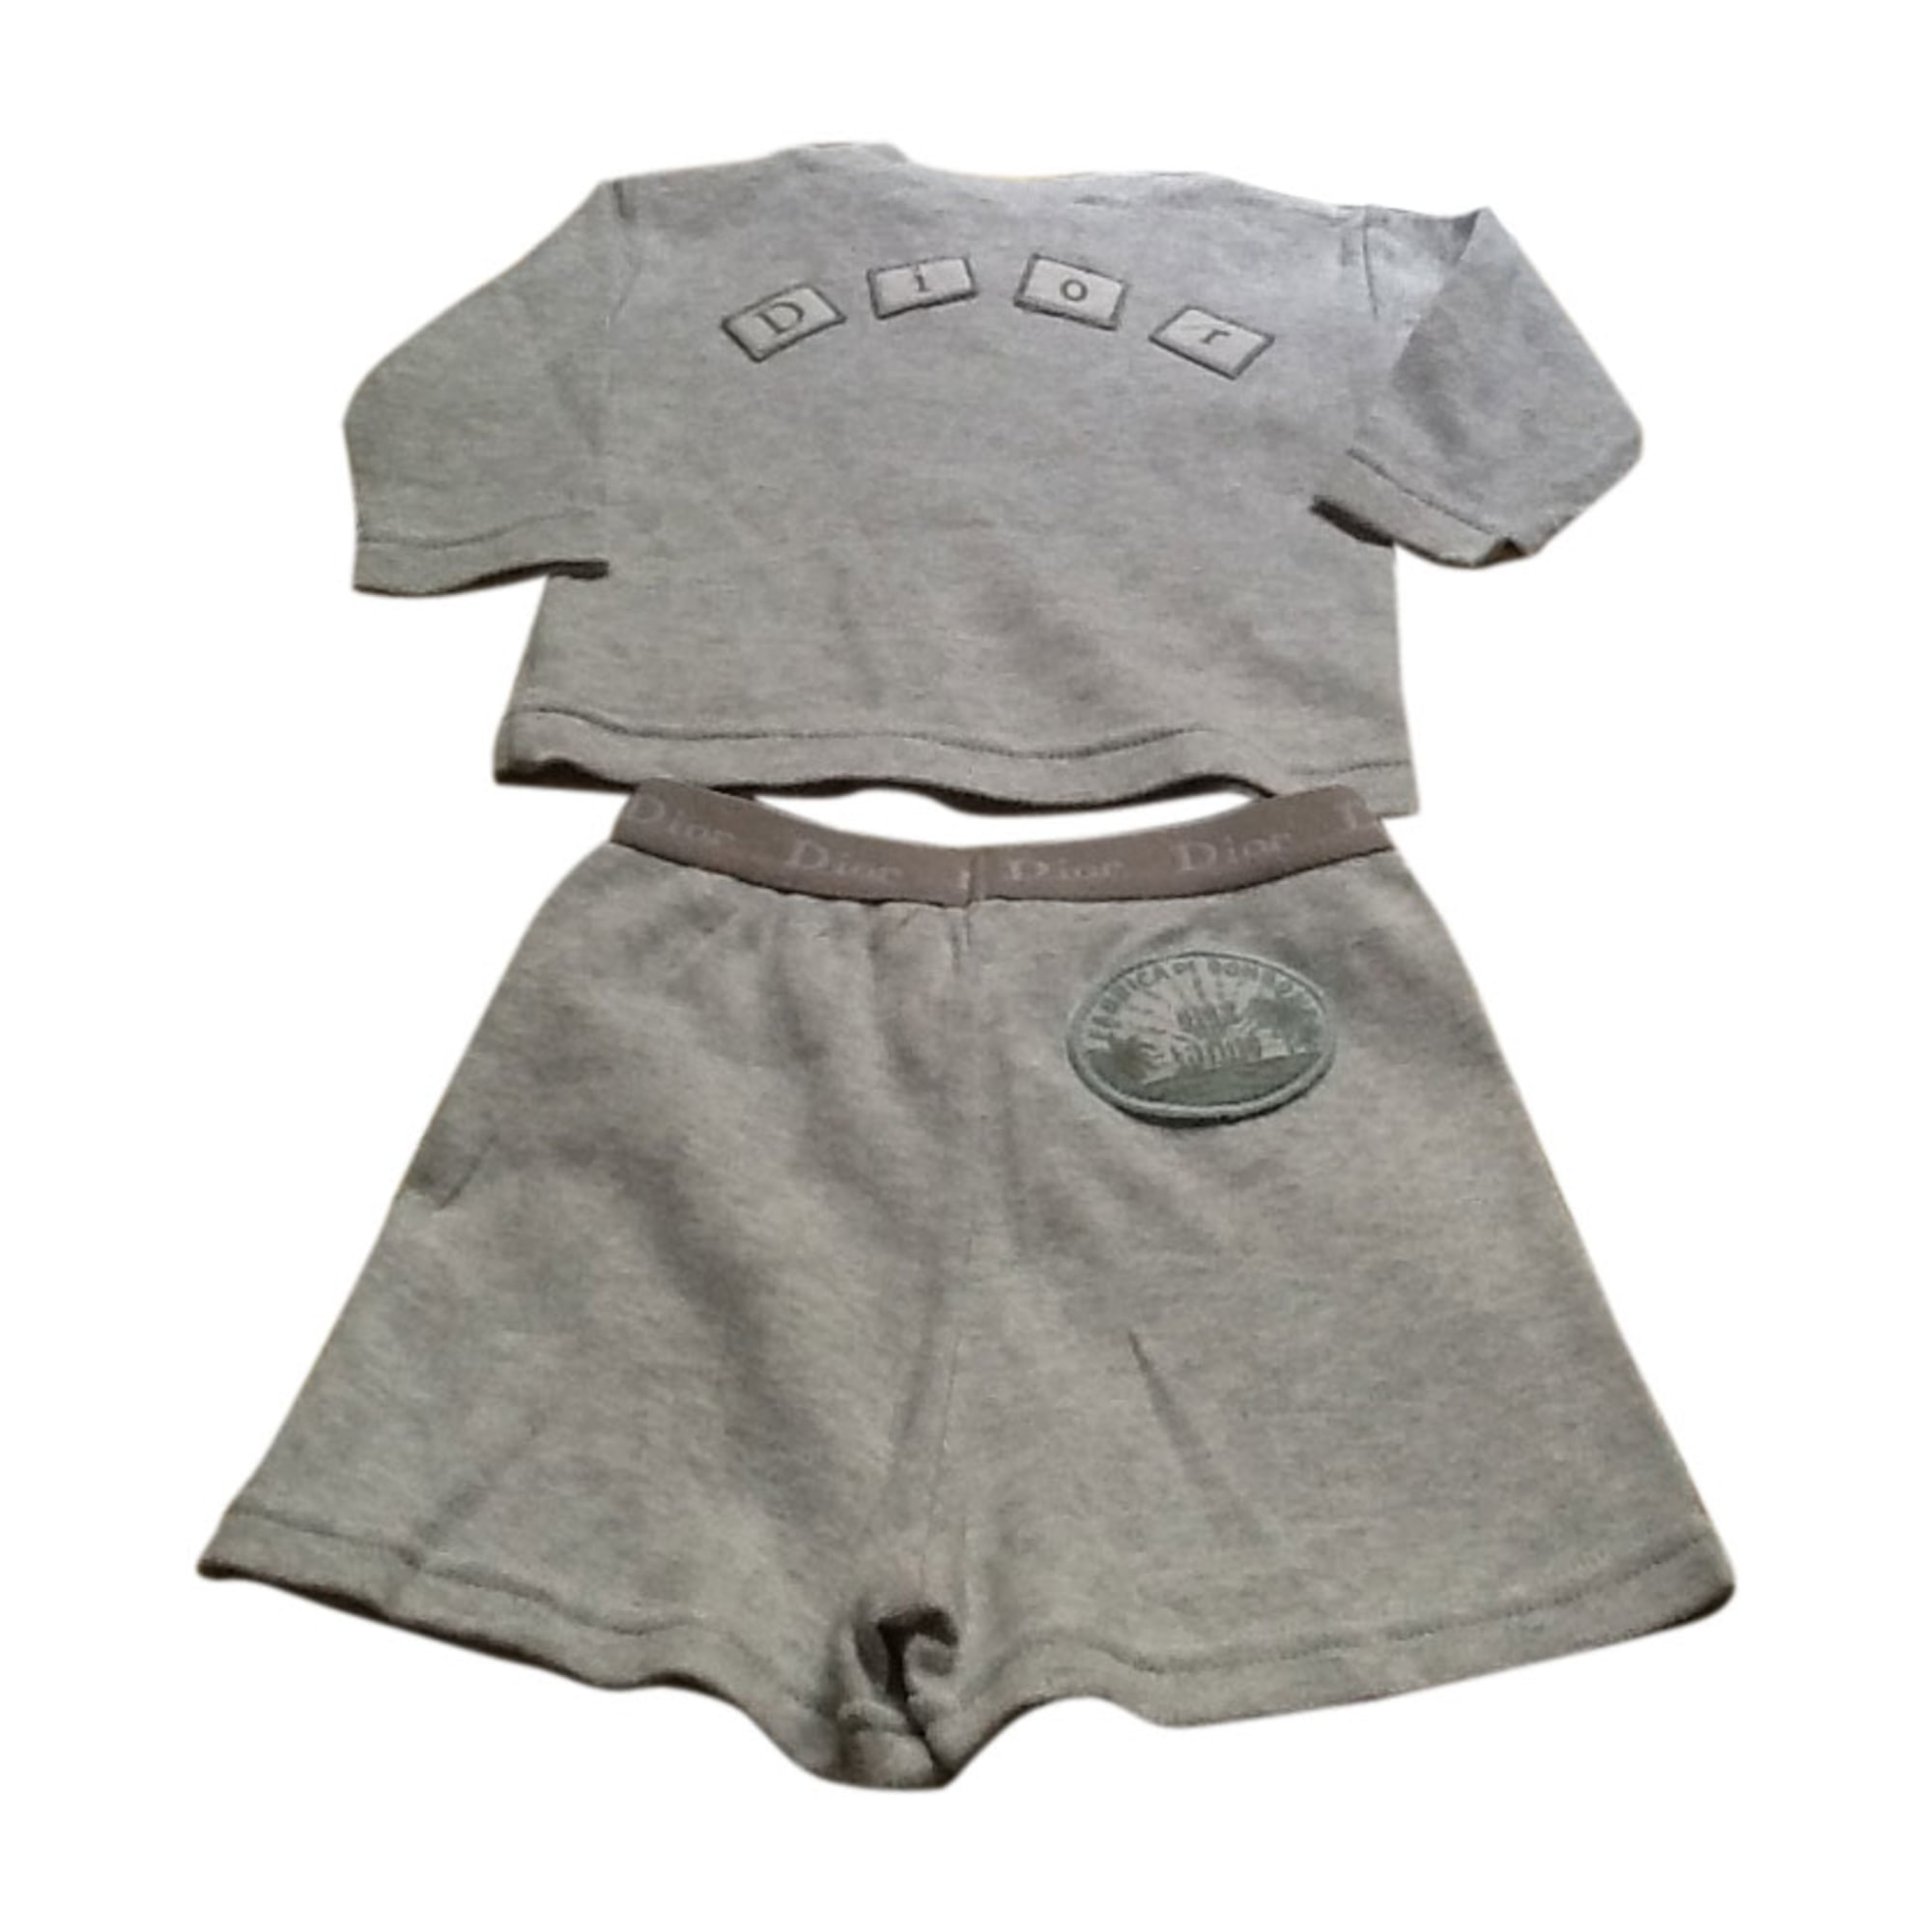 Shorts Set, Outfit BABY DIOR Gray, charcoal